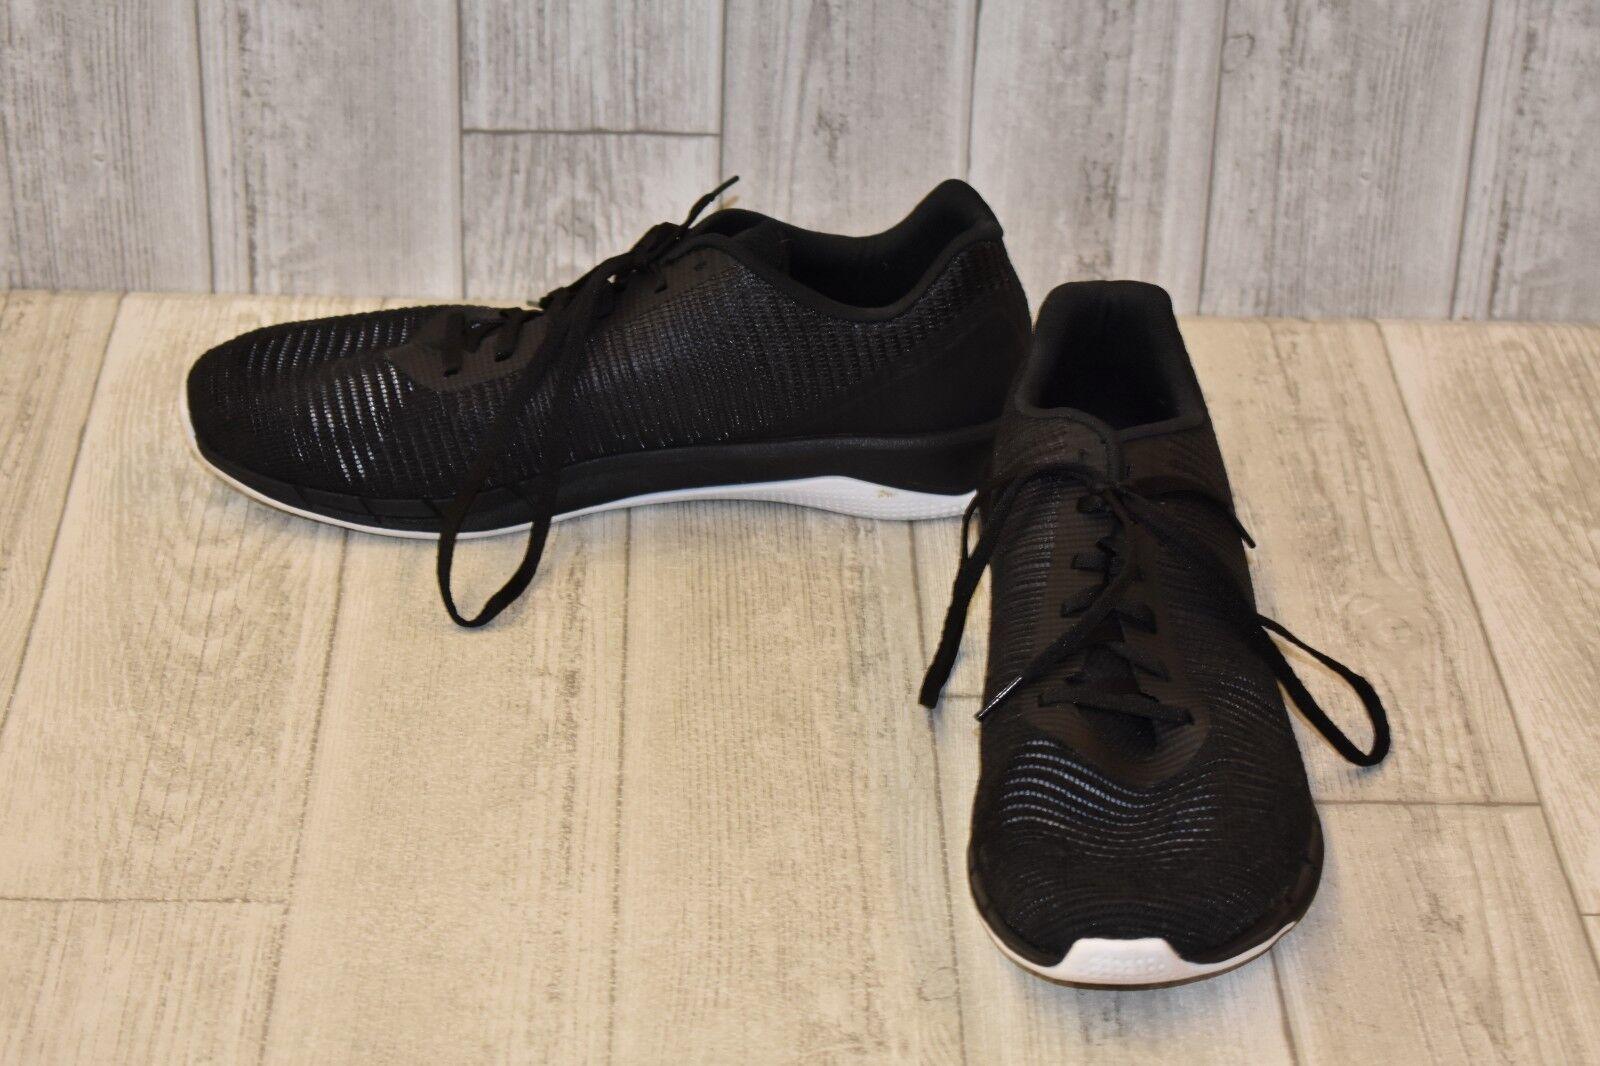 b1bd933c9 Reebok Fast Flexweave Running Shoes-men s Size 13 Black for sale ...